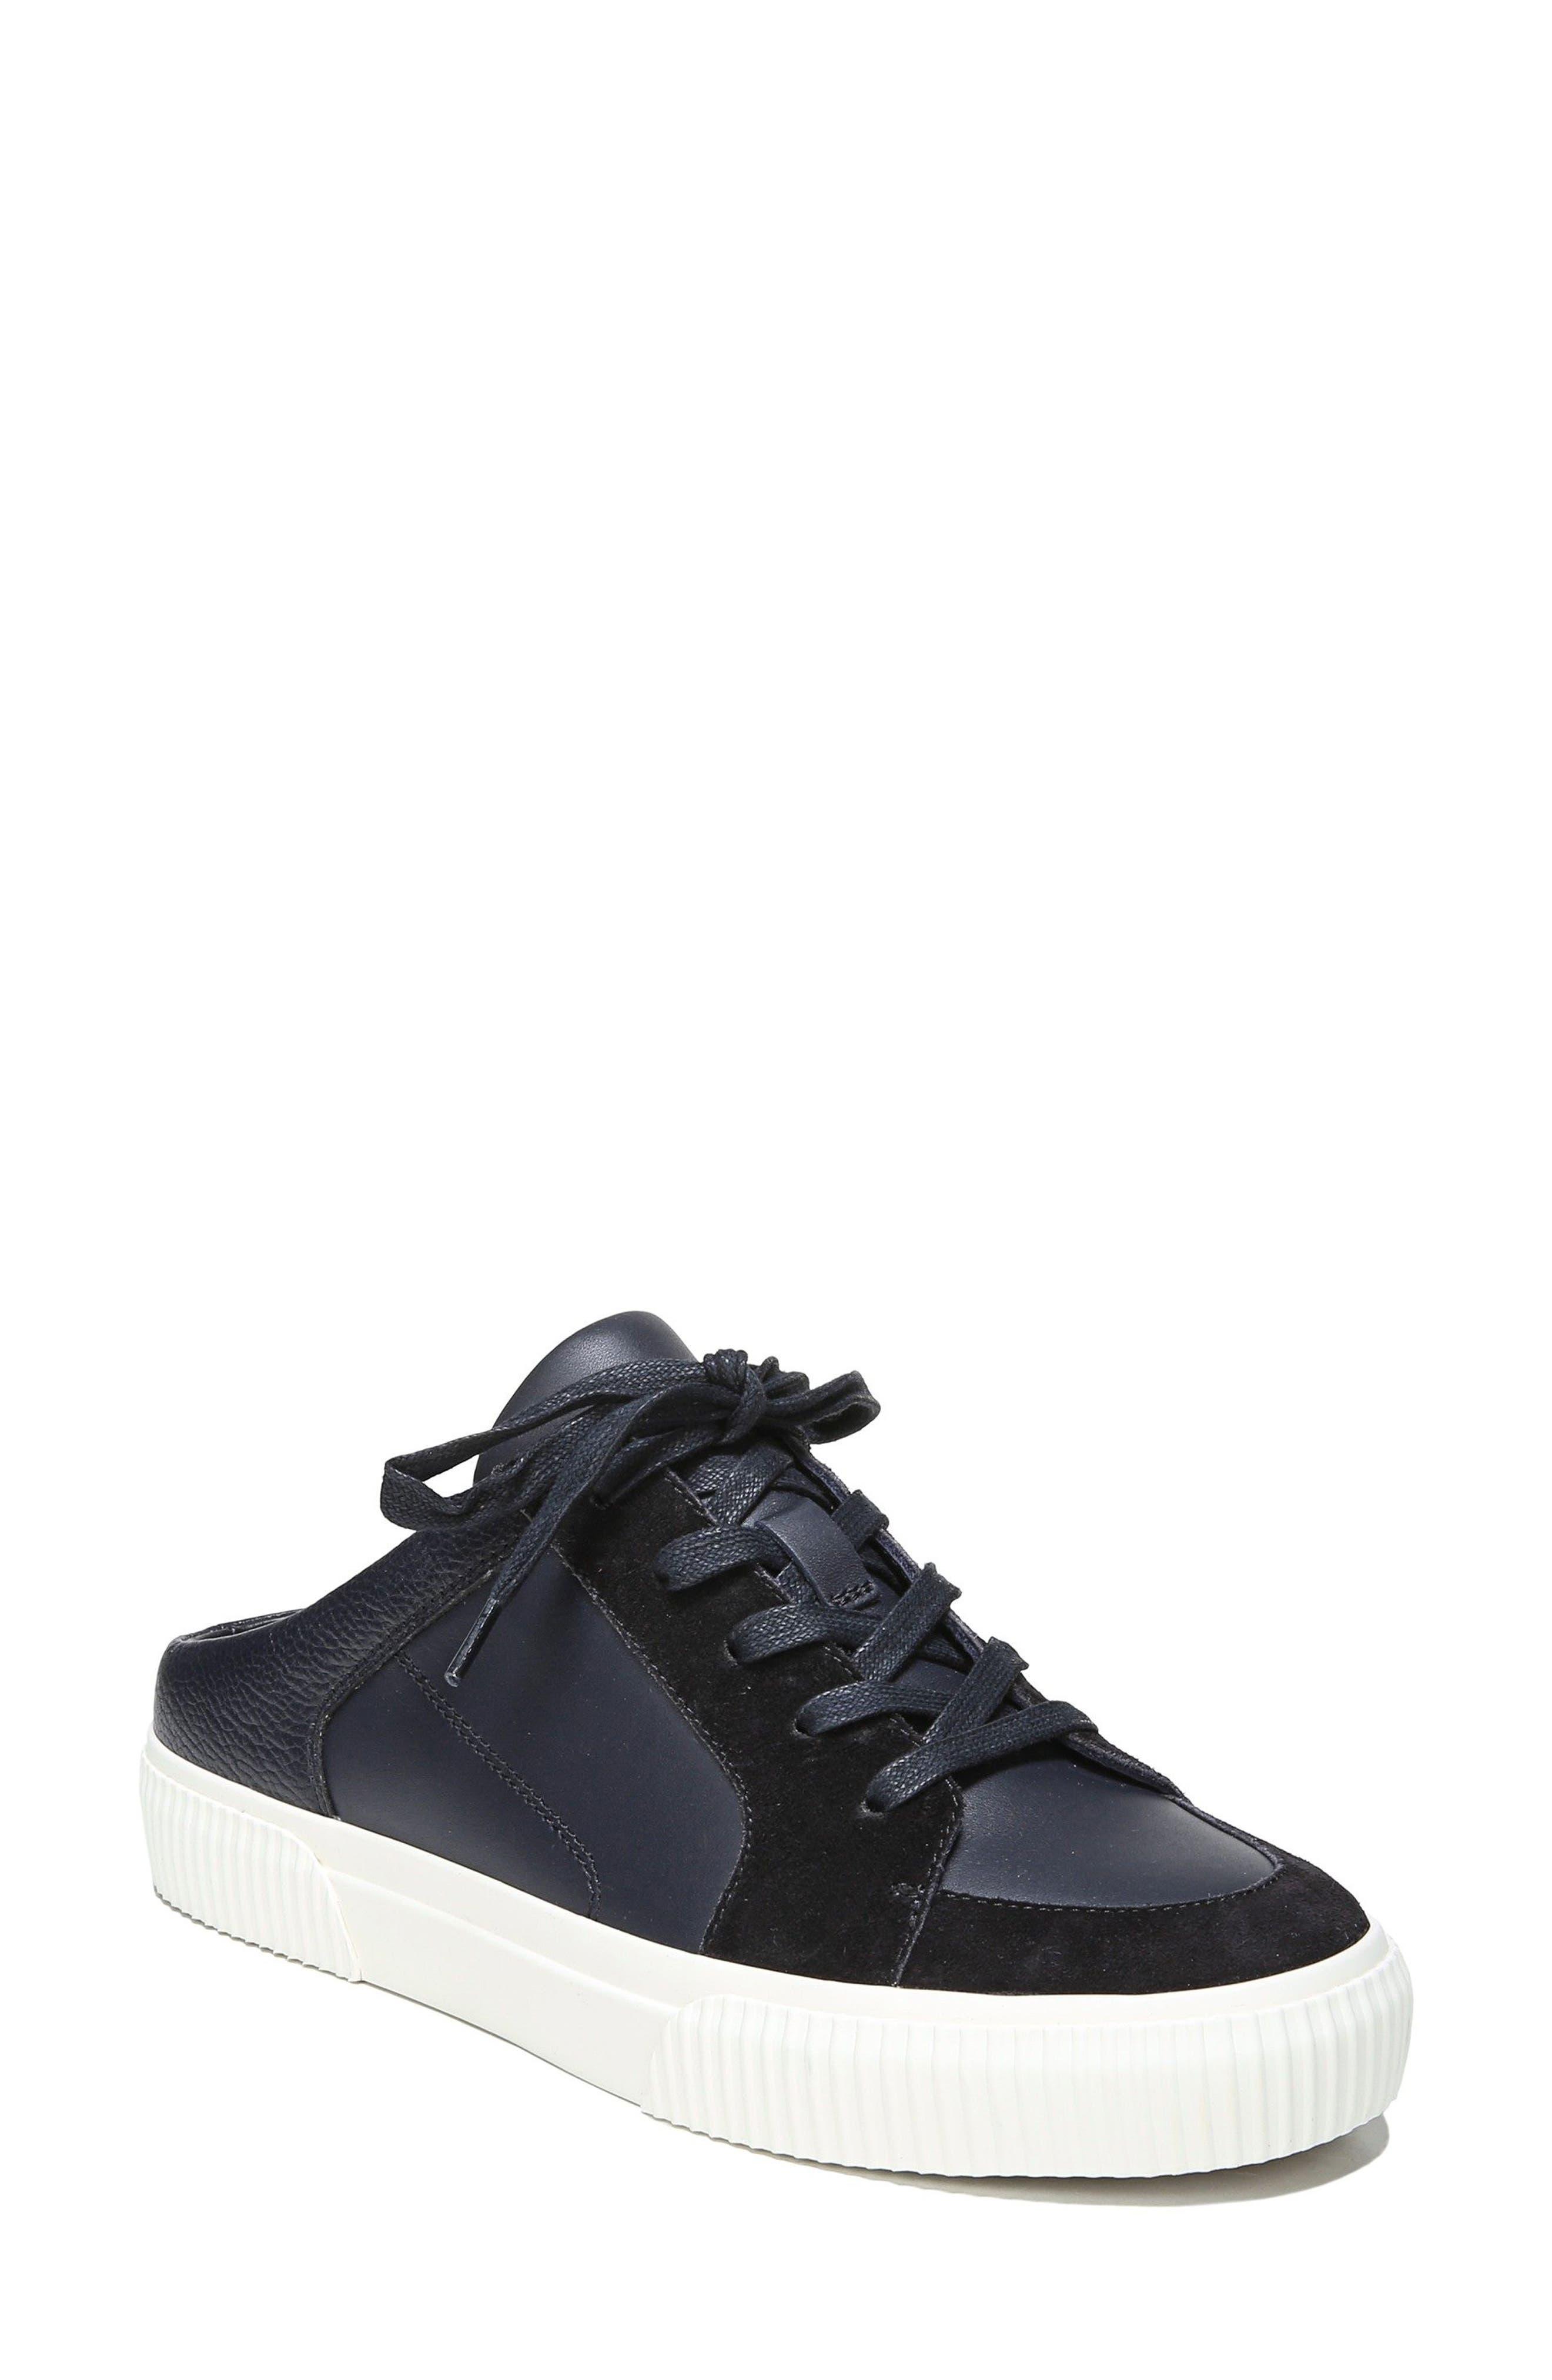 Kess Slip-On Sneaker,                         Main,                         color, Coastal